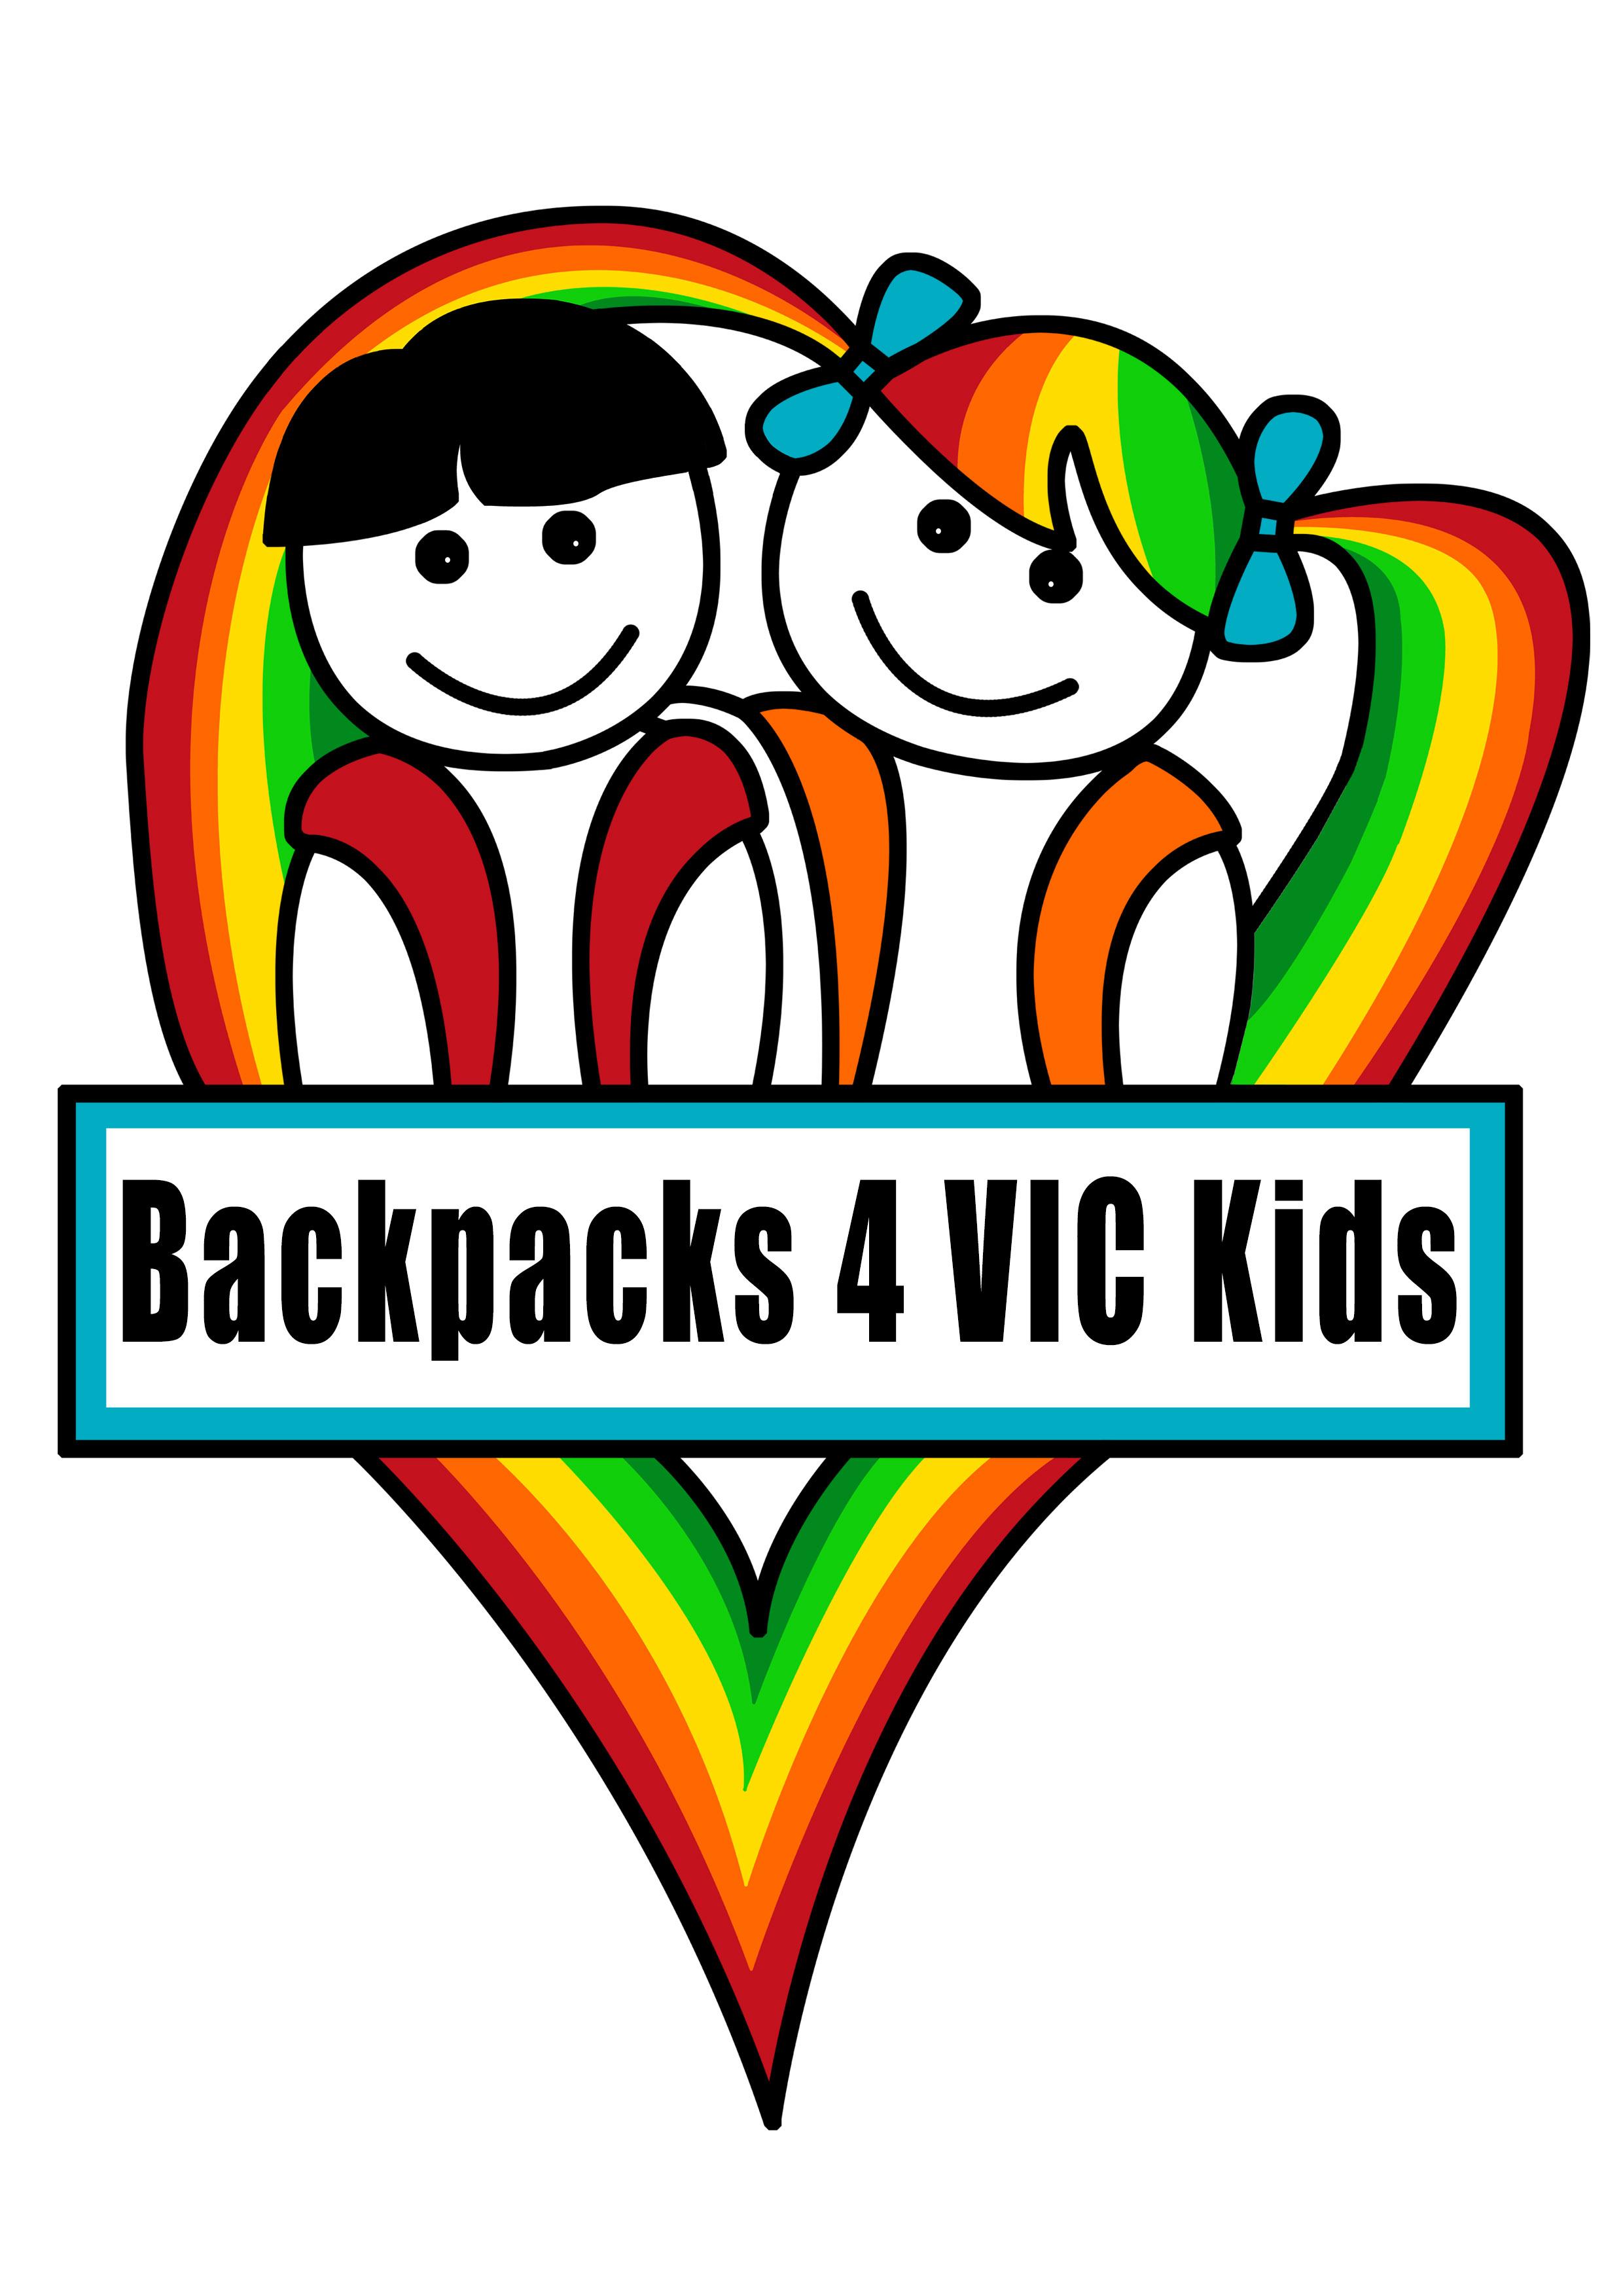 Backpacks 4 VIC Kids Inc